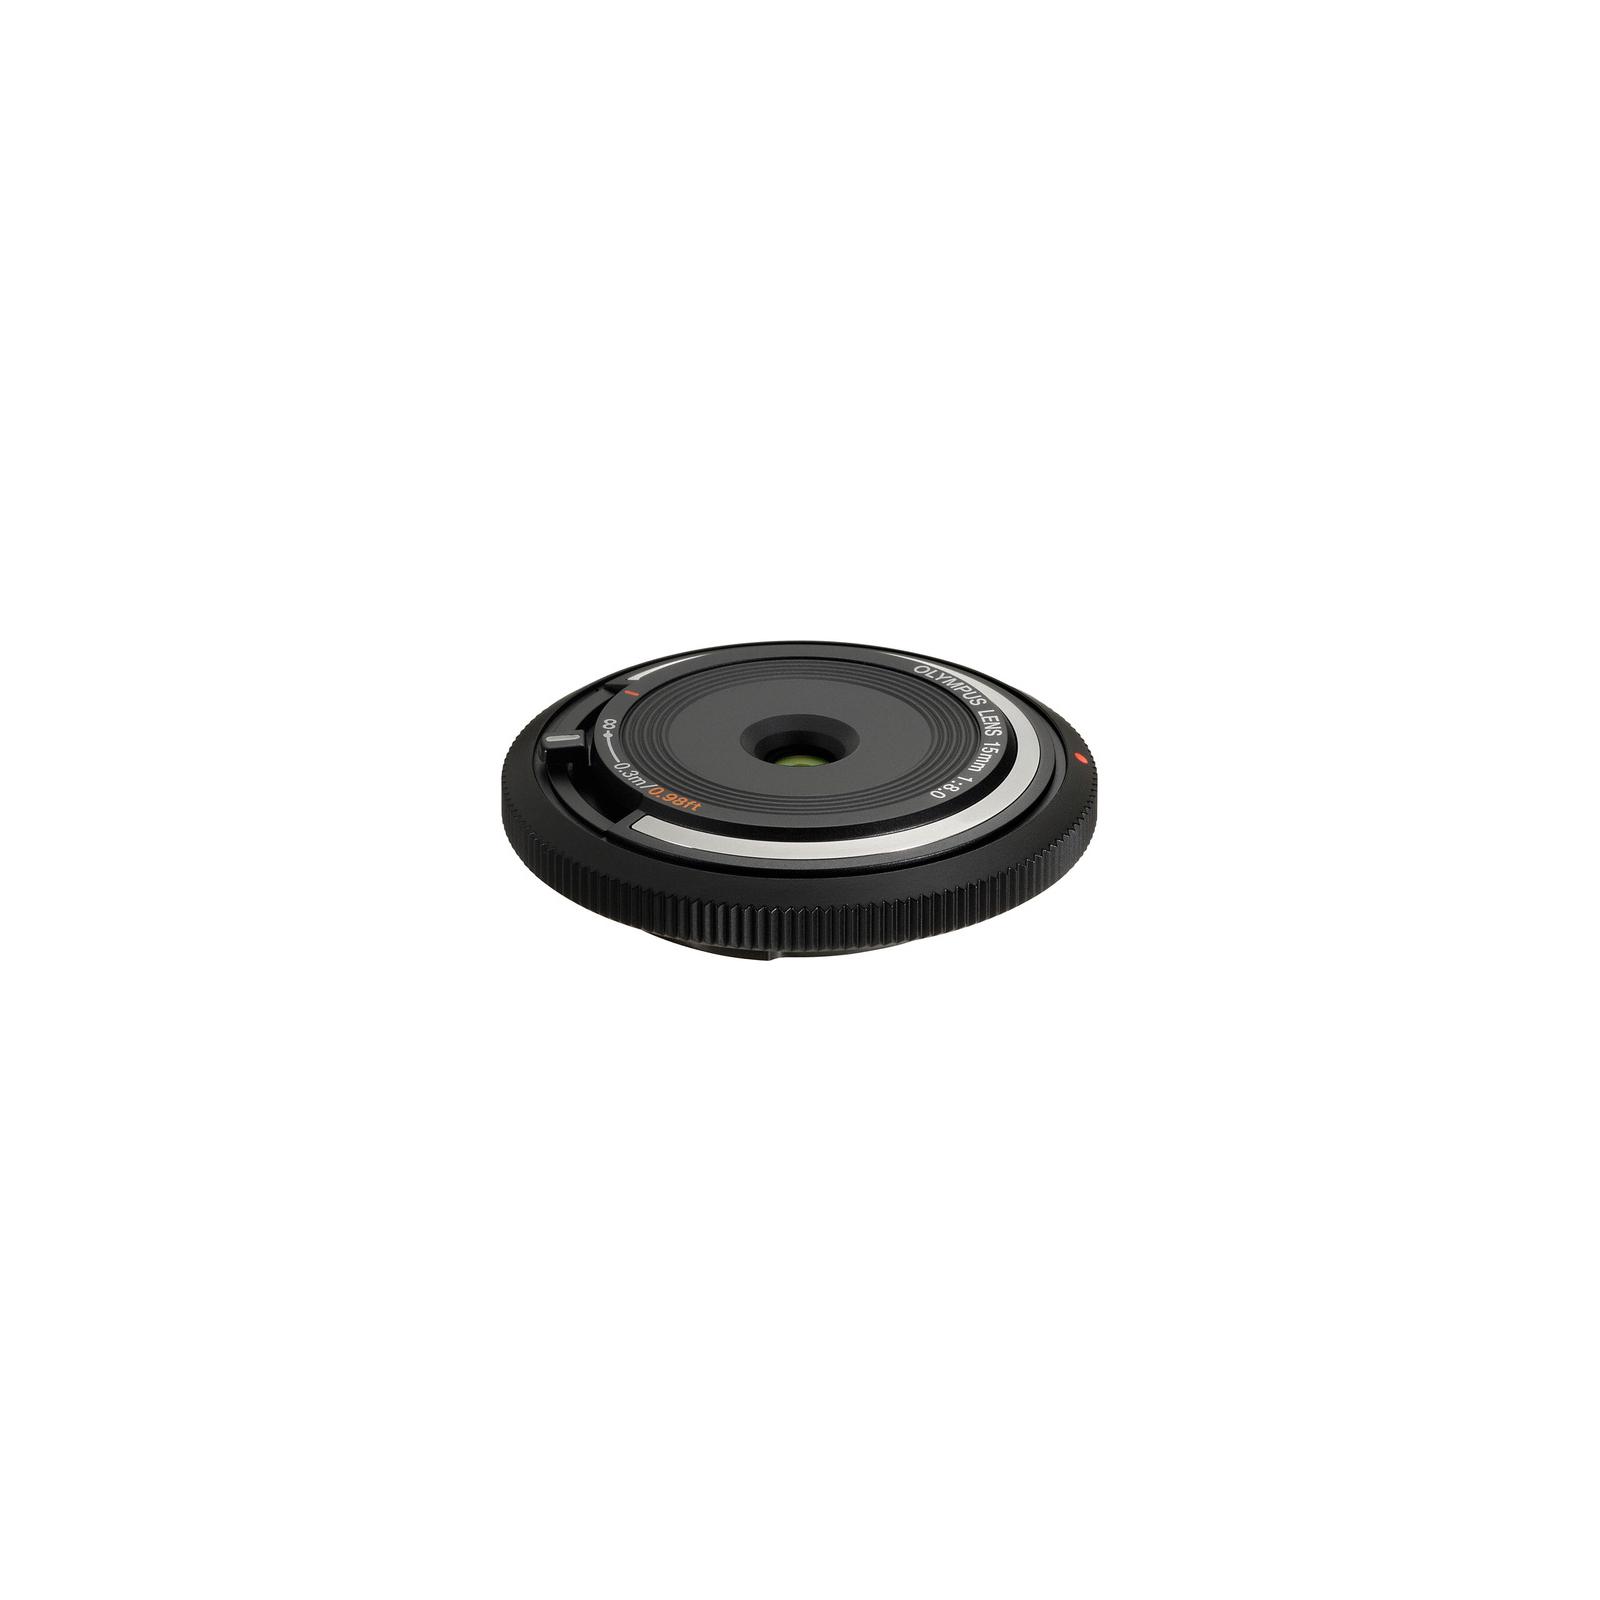 Объектив OLYMPUS BCL-1580 Body Cap Lens 15mm 1:8.0 Black (V325010BE000)